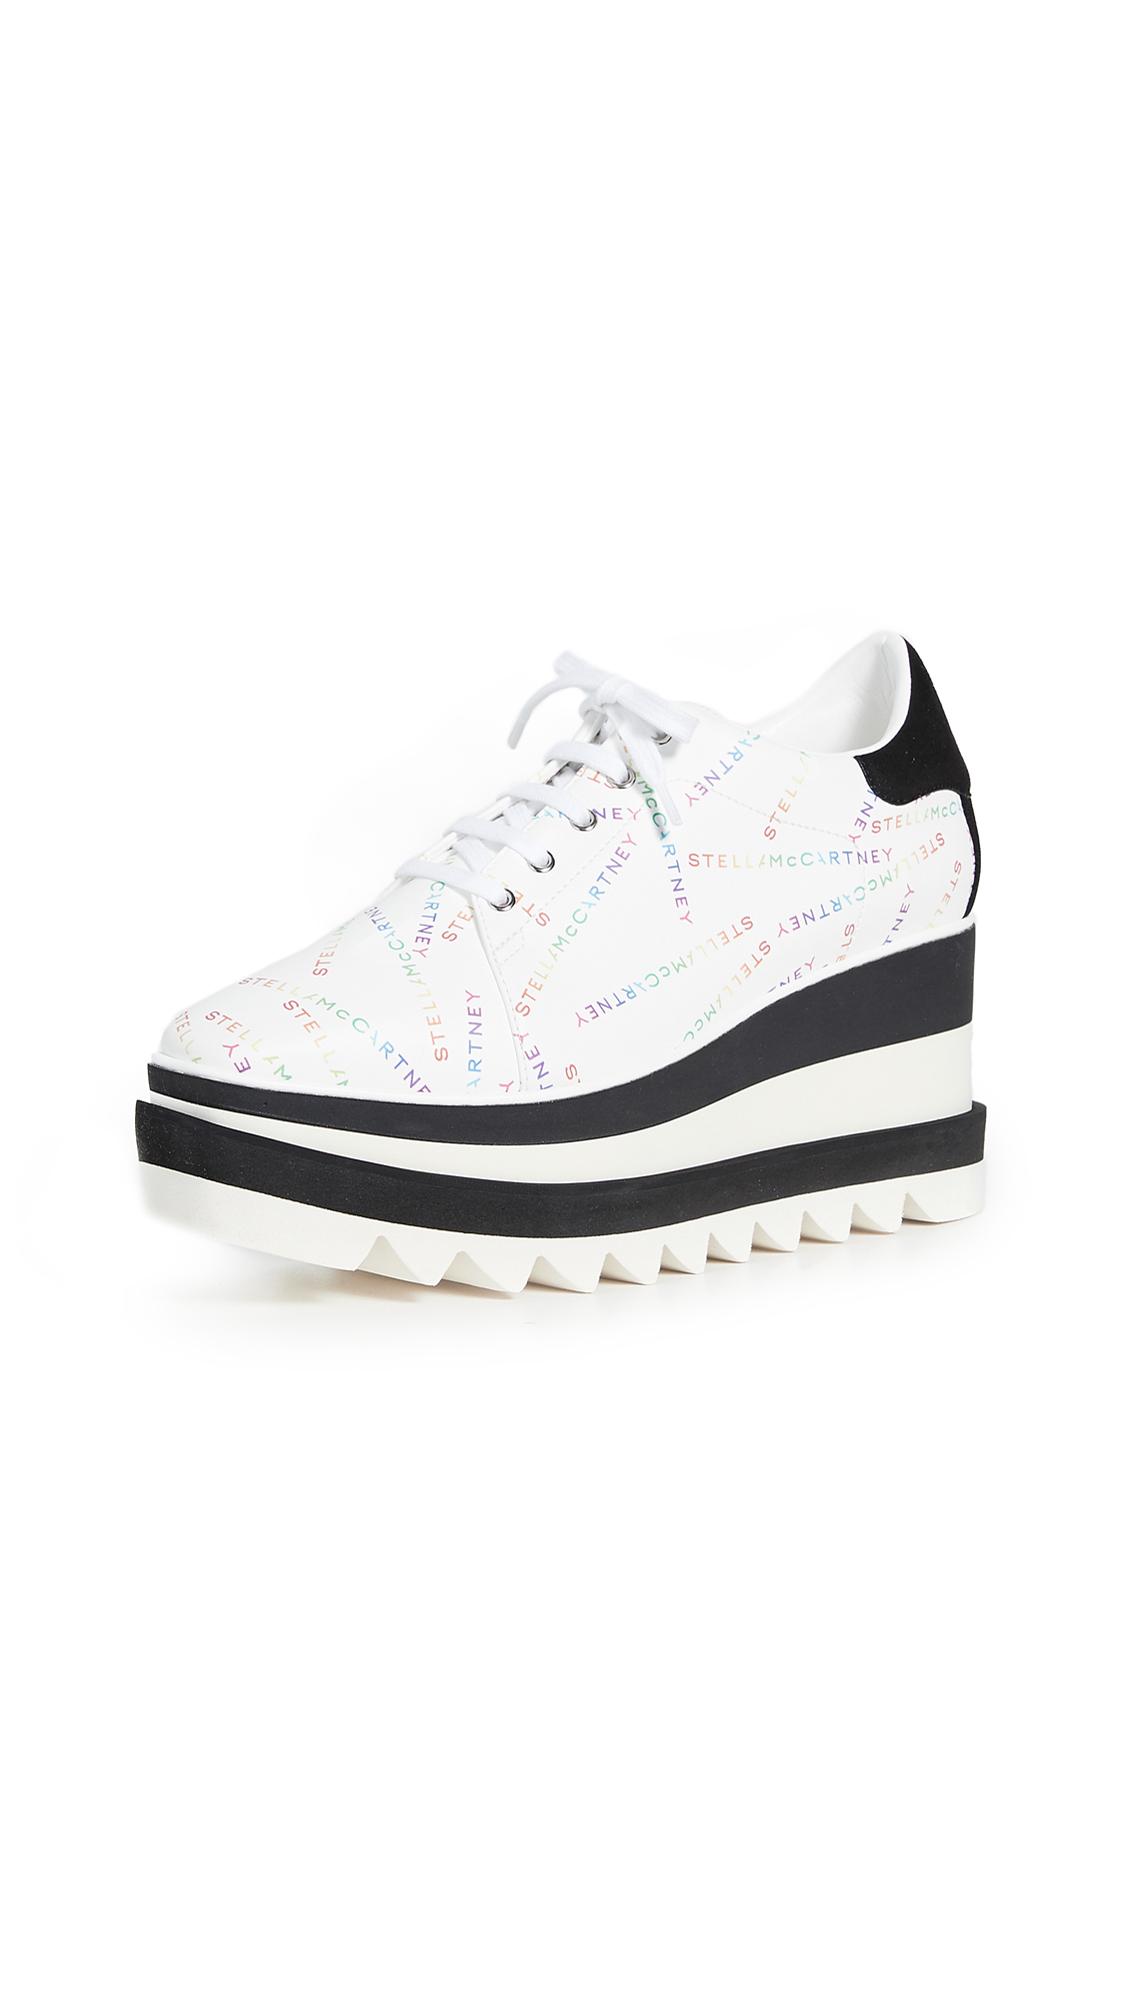 Stella McCartney Sneakelyse Lace Up Sneakers – 40% Off Sale